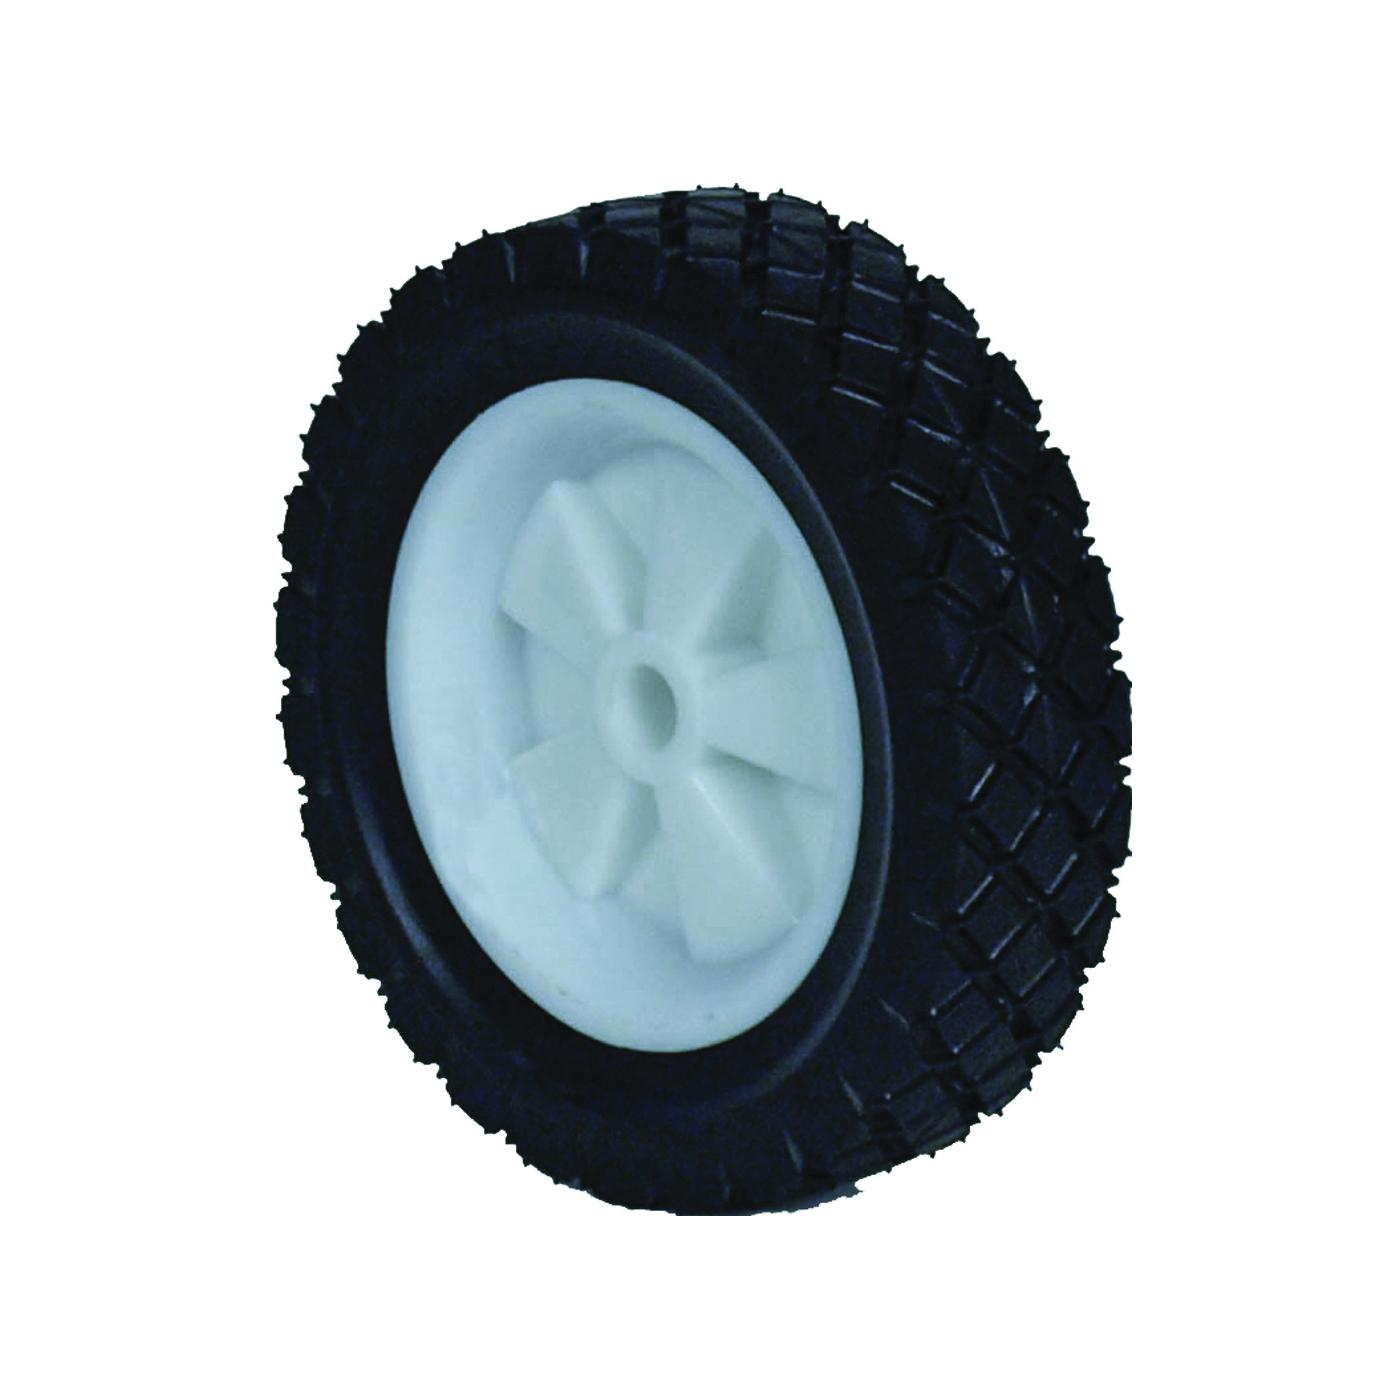 Picture of MARTIN WHEEL 715P-OF Lawn Mower Wheel, Semi-Pneumatic, Plastic/Rubber